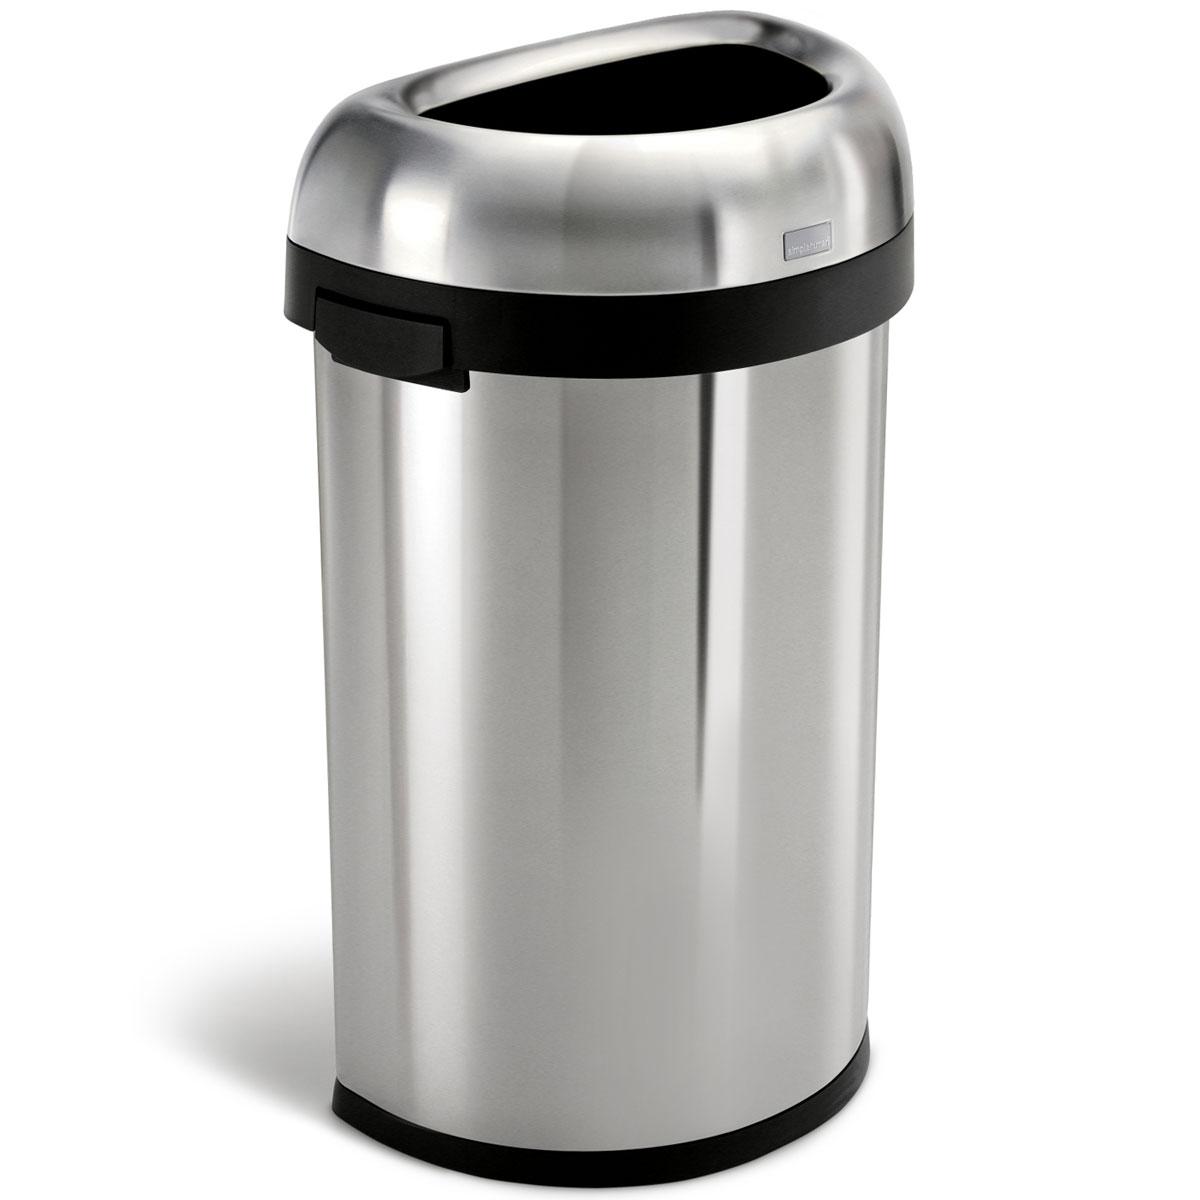 simplehuman ゴミ箱 オープンカン 60L ダストボックス ごみ箱 業務用ゴミ箱 商業施設 シンプルヒューマン 正規品 1年間メーカー保証付き ゴミ箱 CW1468 セミラウンドオープンカン 60リットル